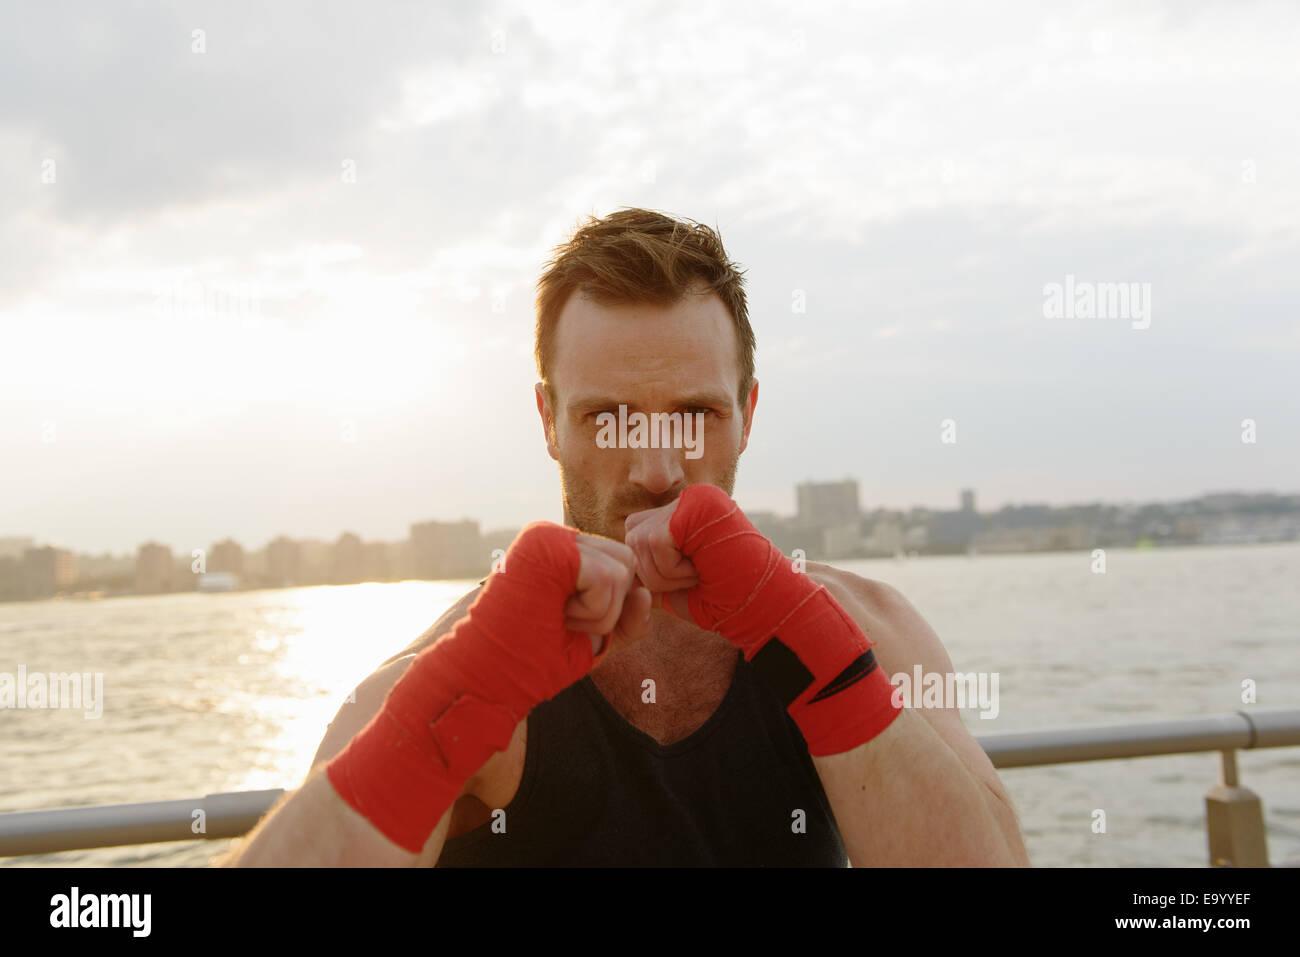 Retrato de joven boxeador ejercer en Riverside Imagen De Stock